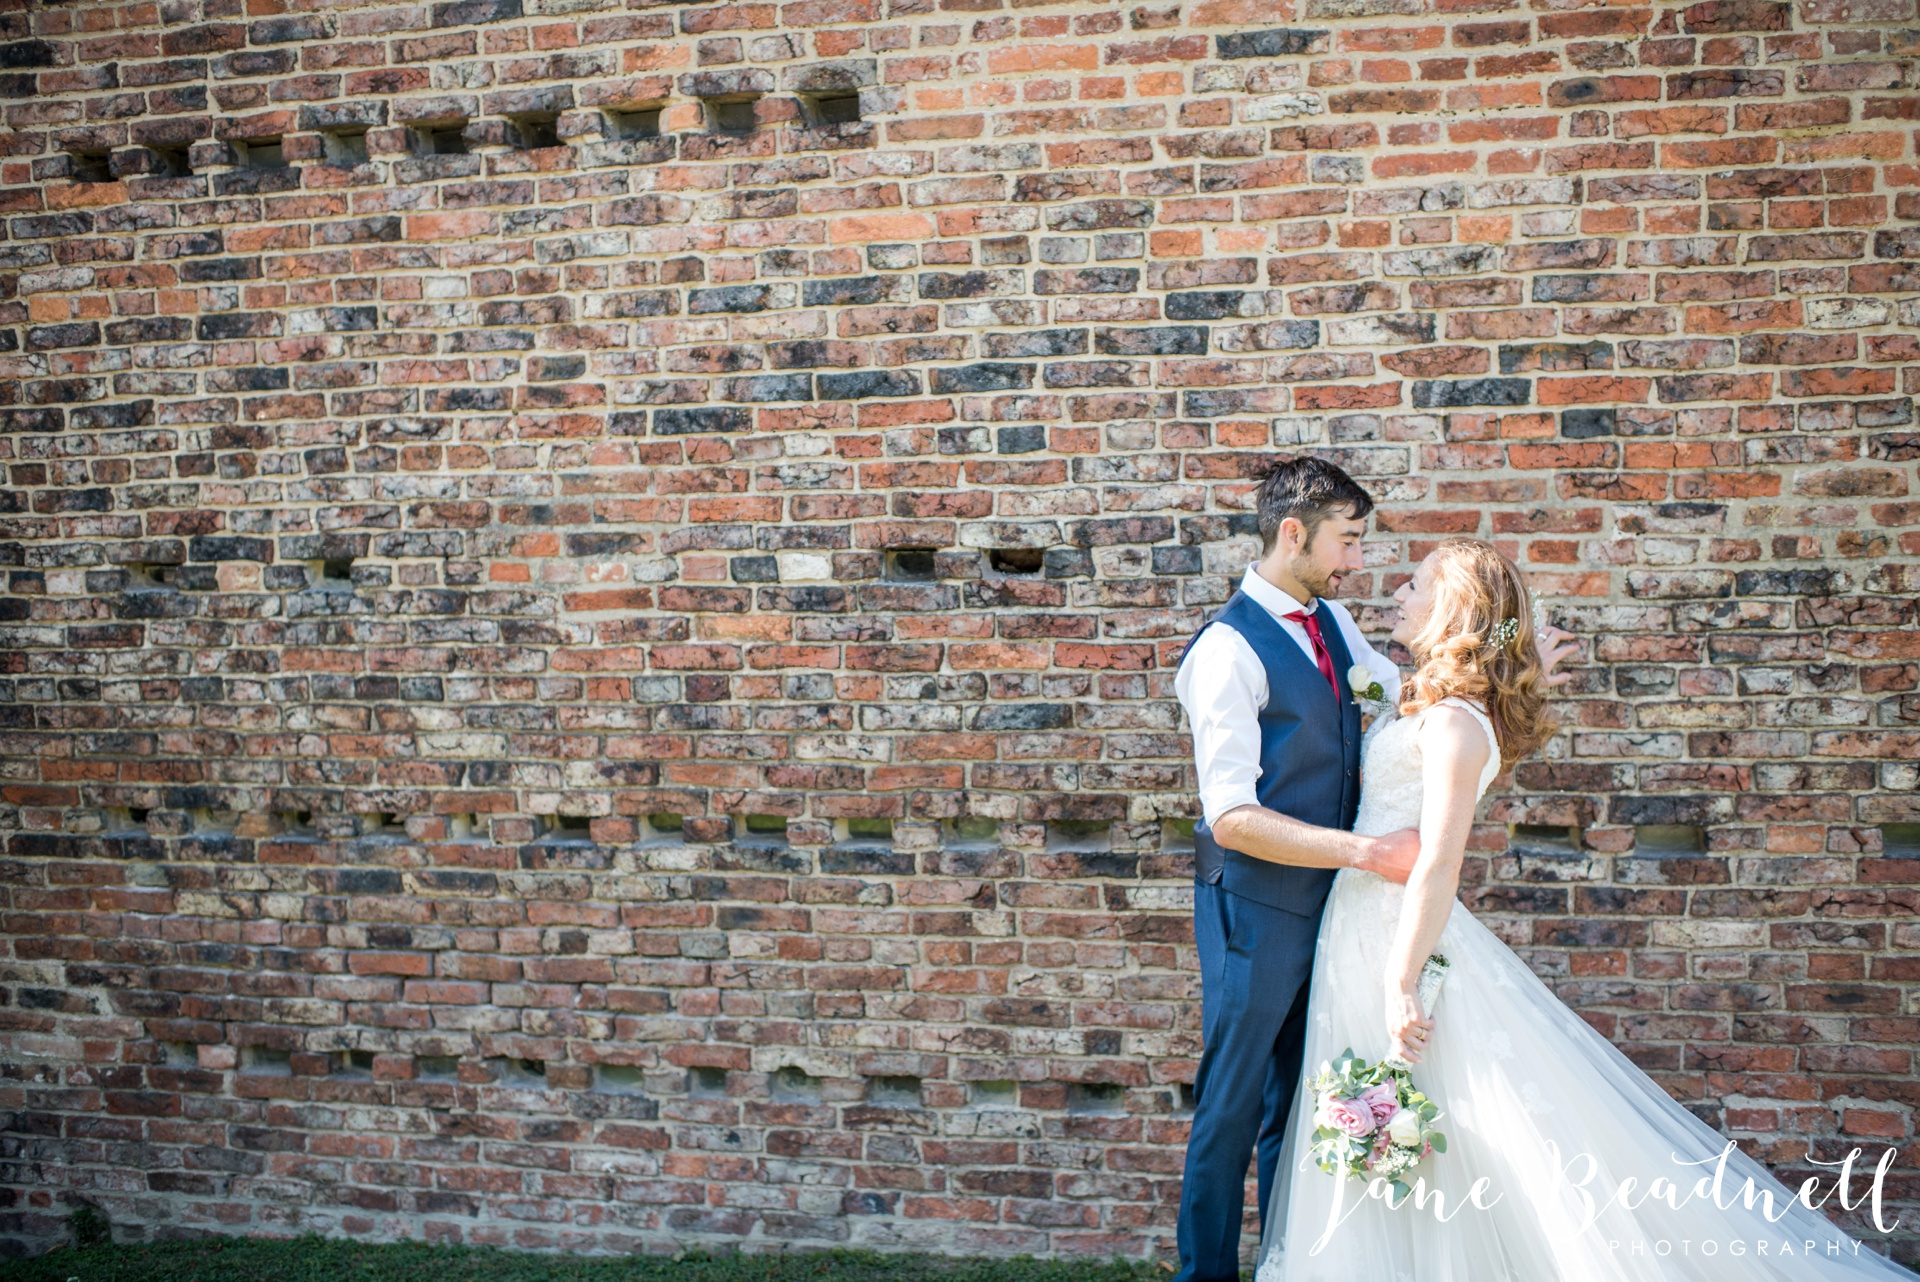 yorkshire-fine-art-wedding-photographer-jane-beadnell-photography-poppleton-york_0111